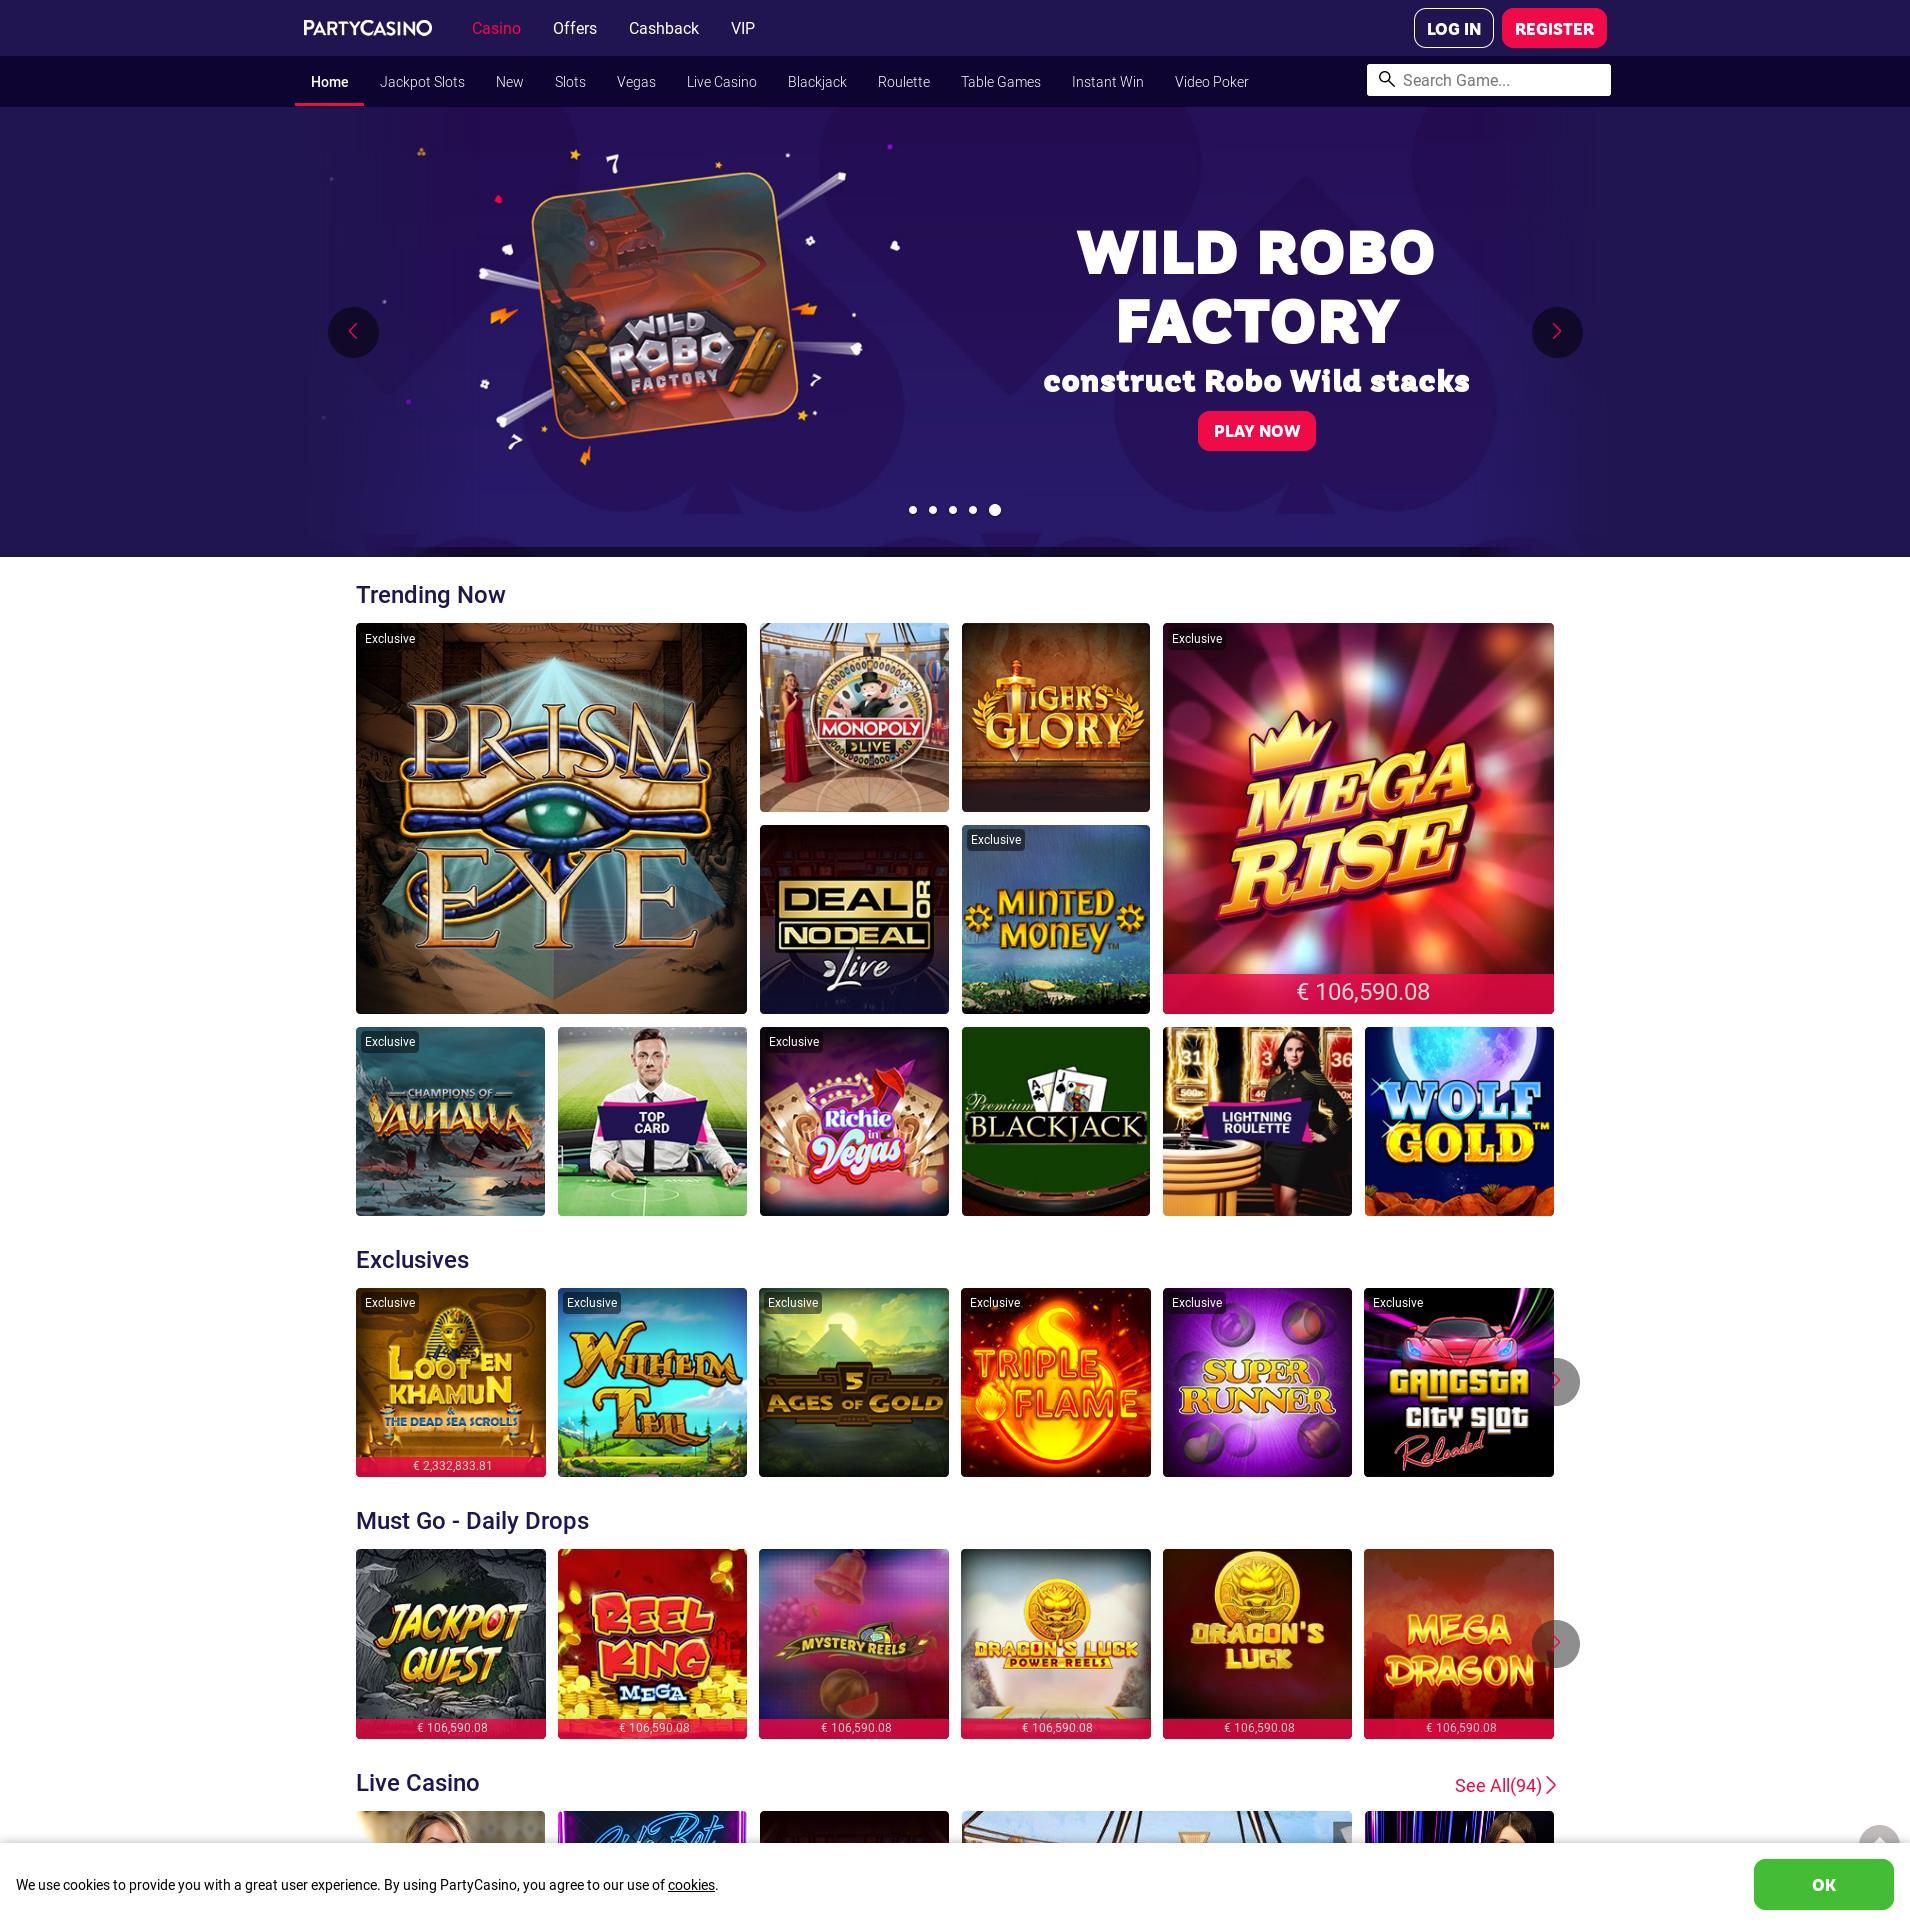 Casino screen Lobby 2019-07-15 for Netherlands